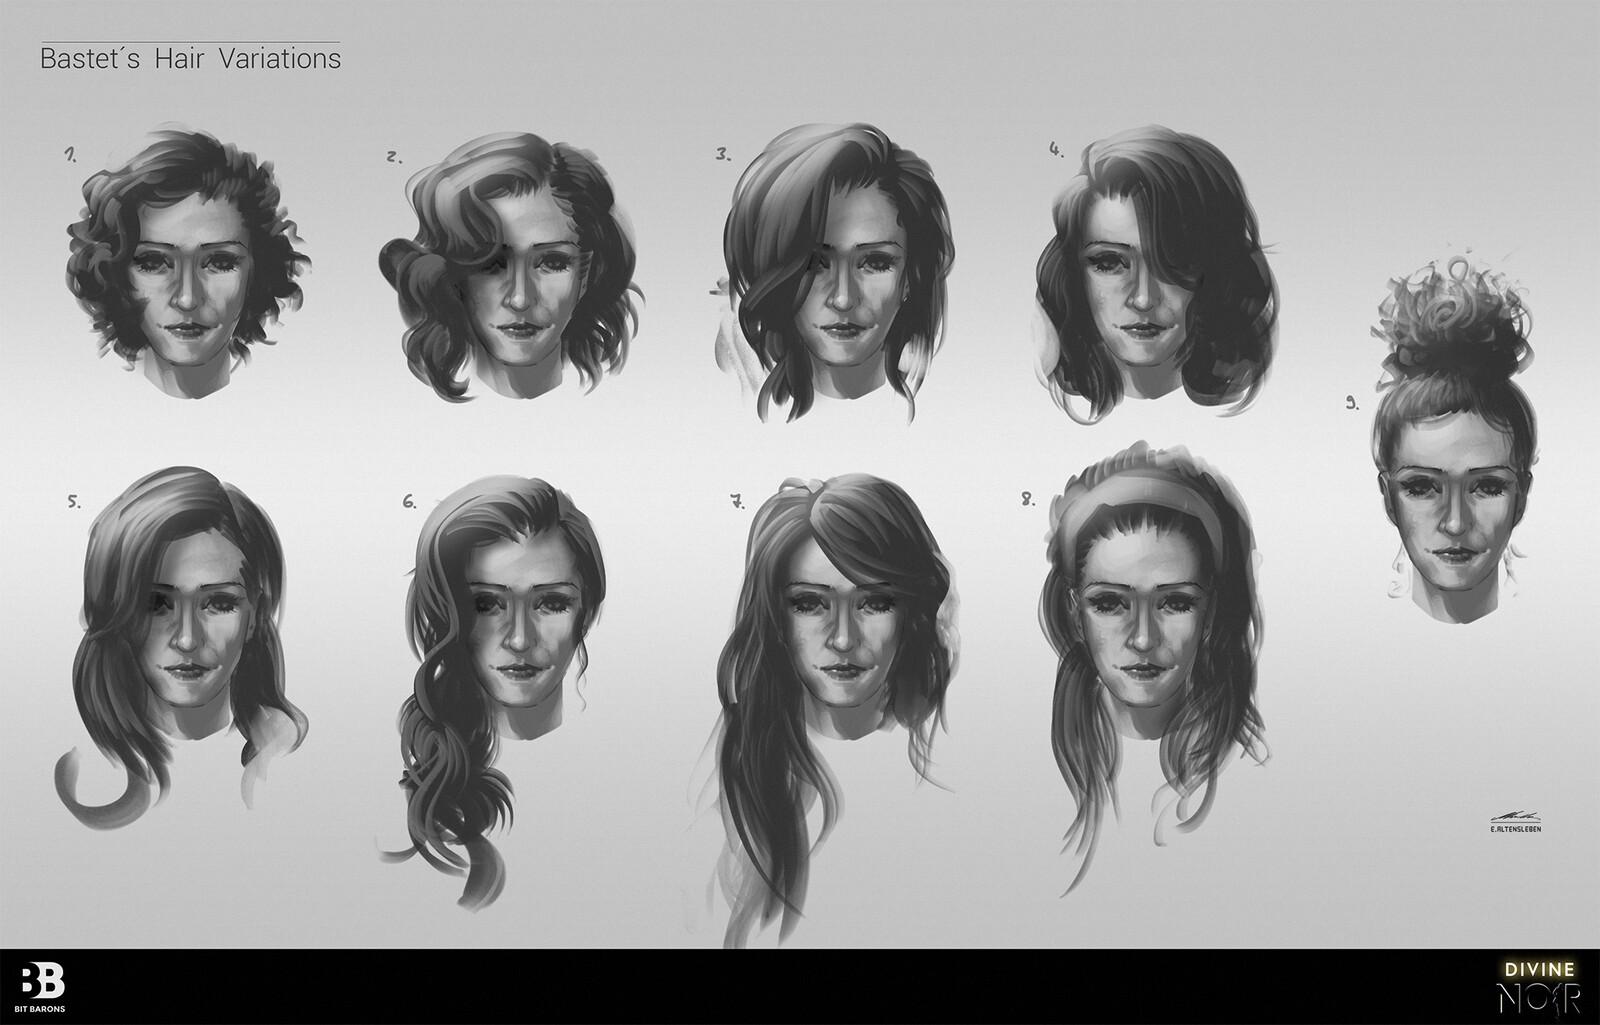 Bastet - Hair Variations